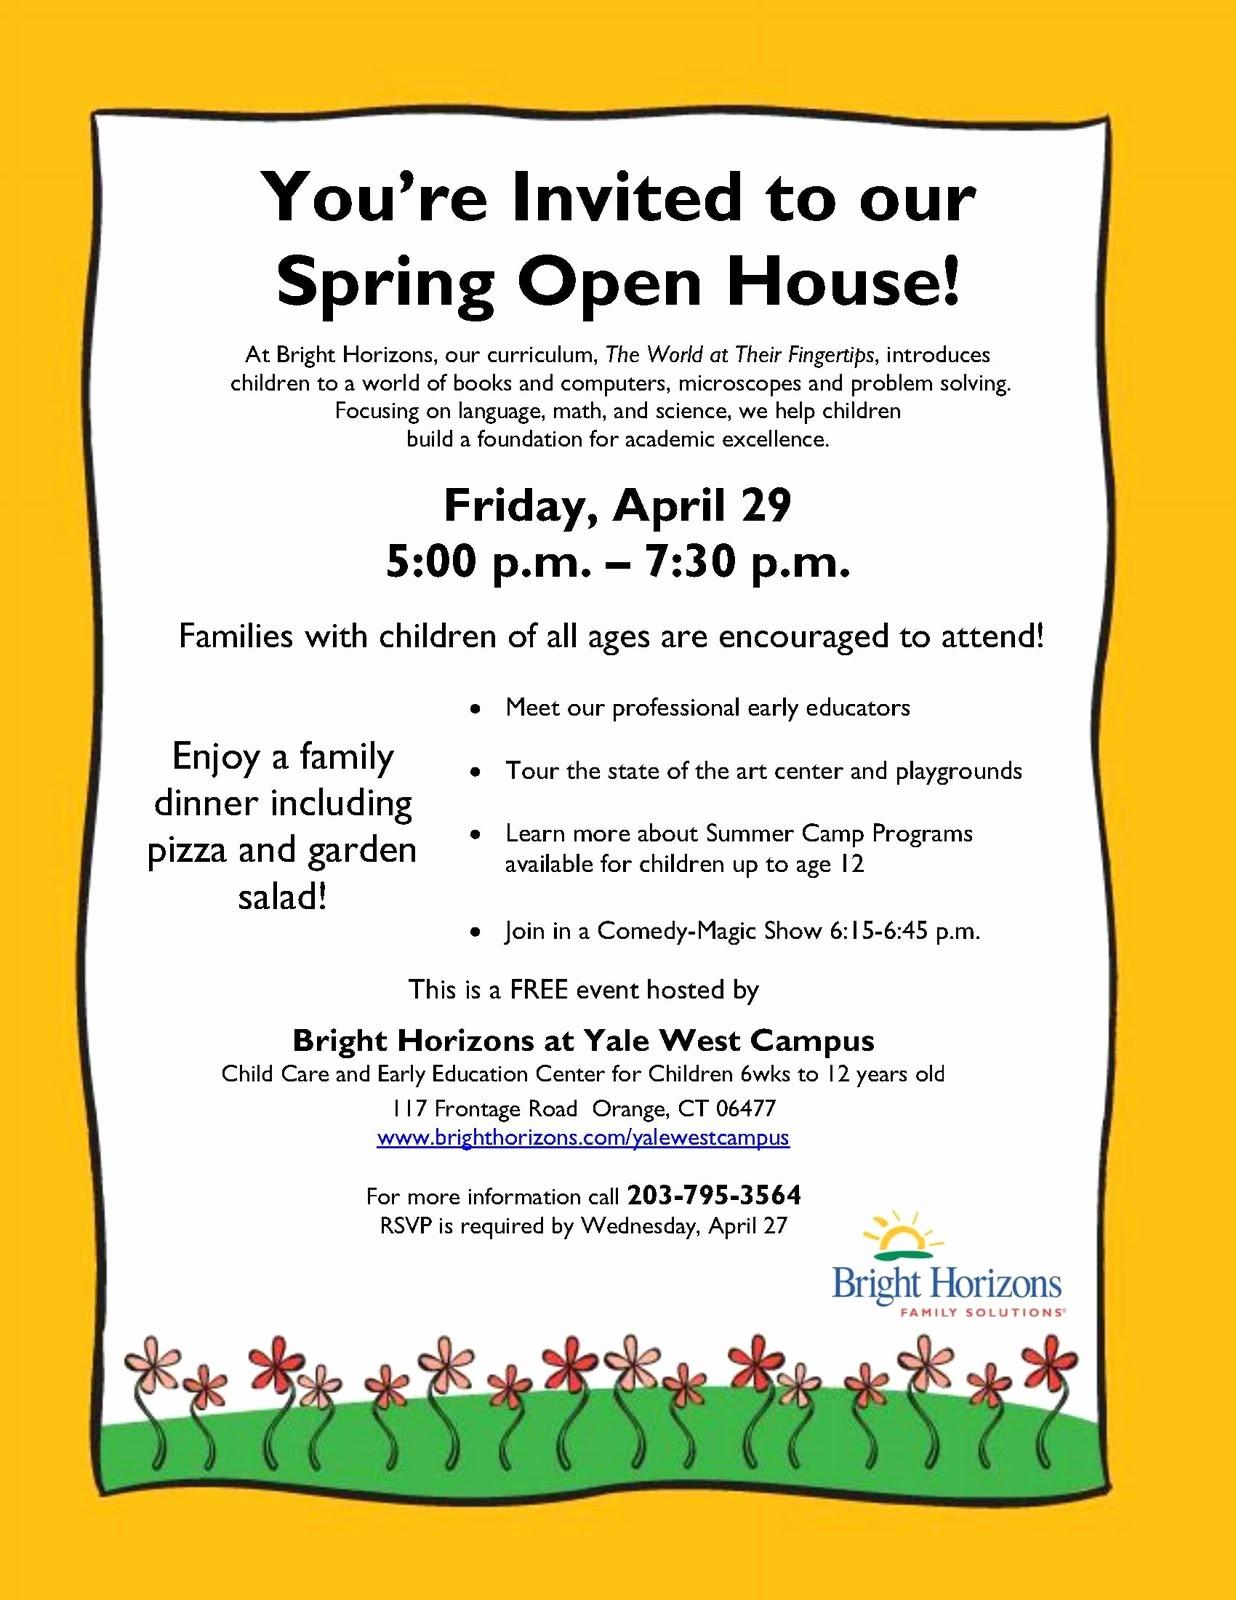 Open House Flyer for School Lovely School Open House Flyer Template Portablegasgrillweber